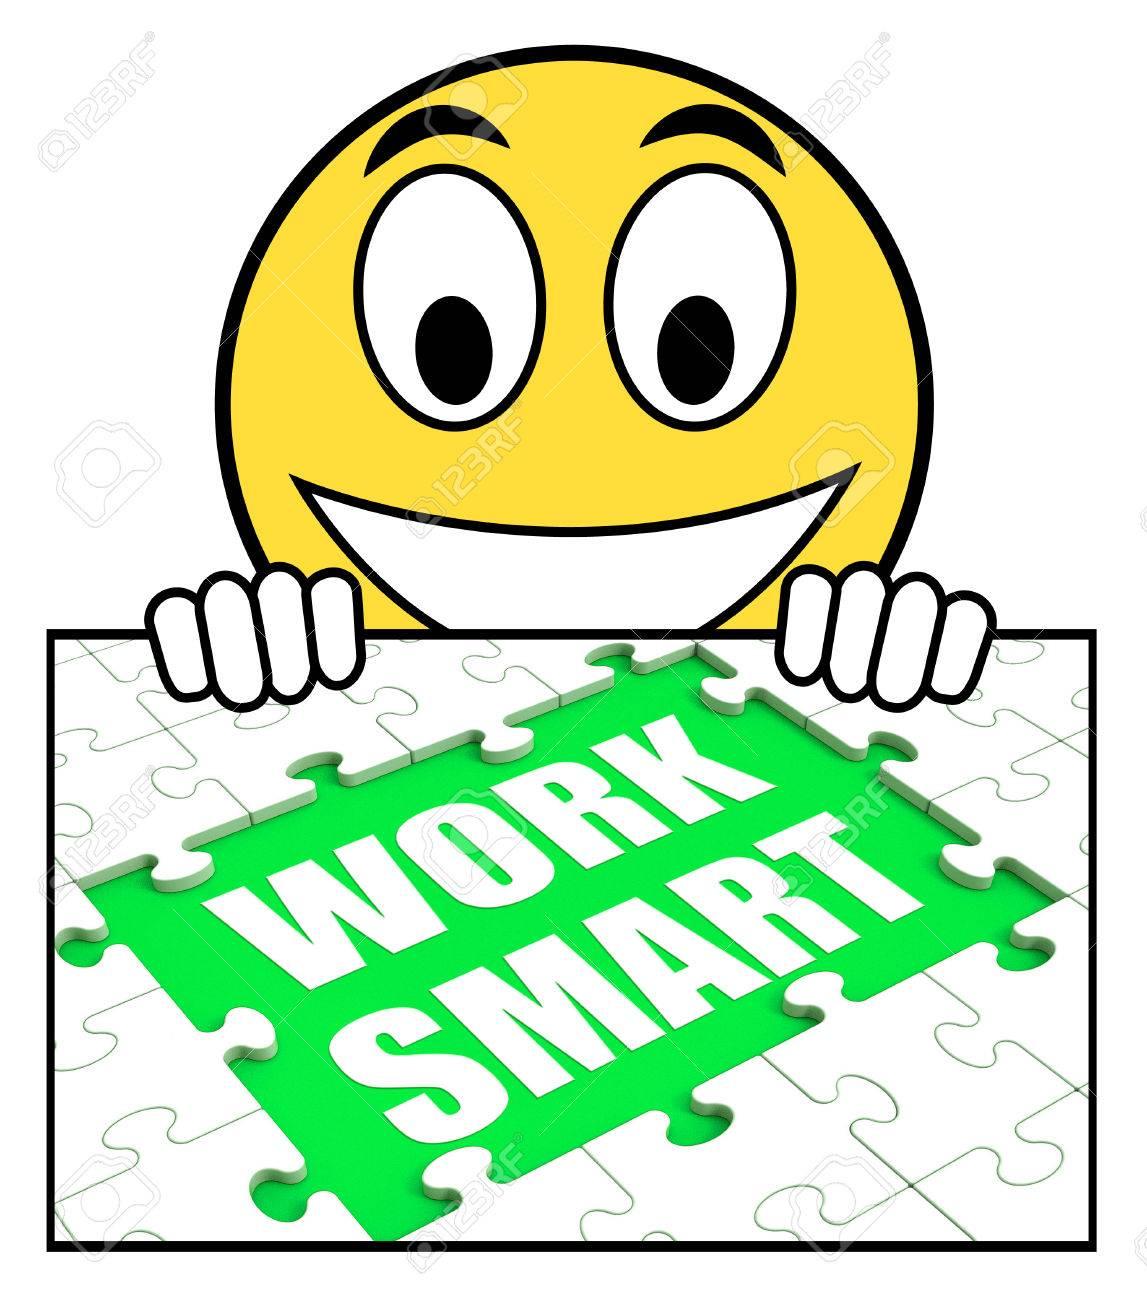 work smart sign showing worker enhancing productivity stock photo stock photo work smart sign showing worker enhancing productivity